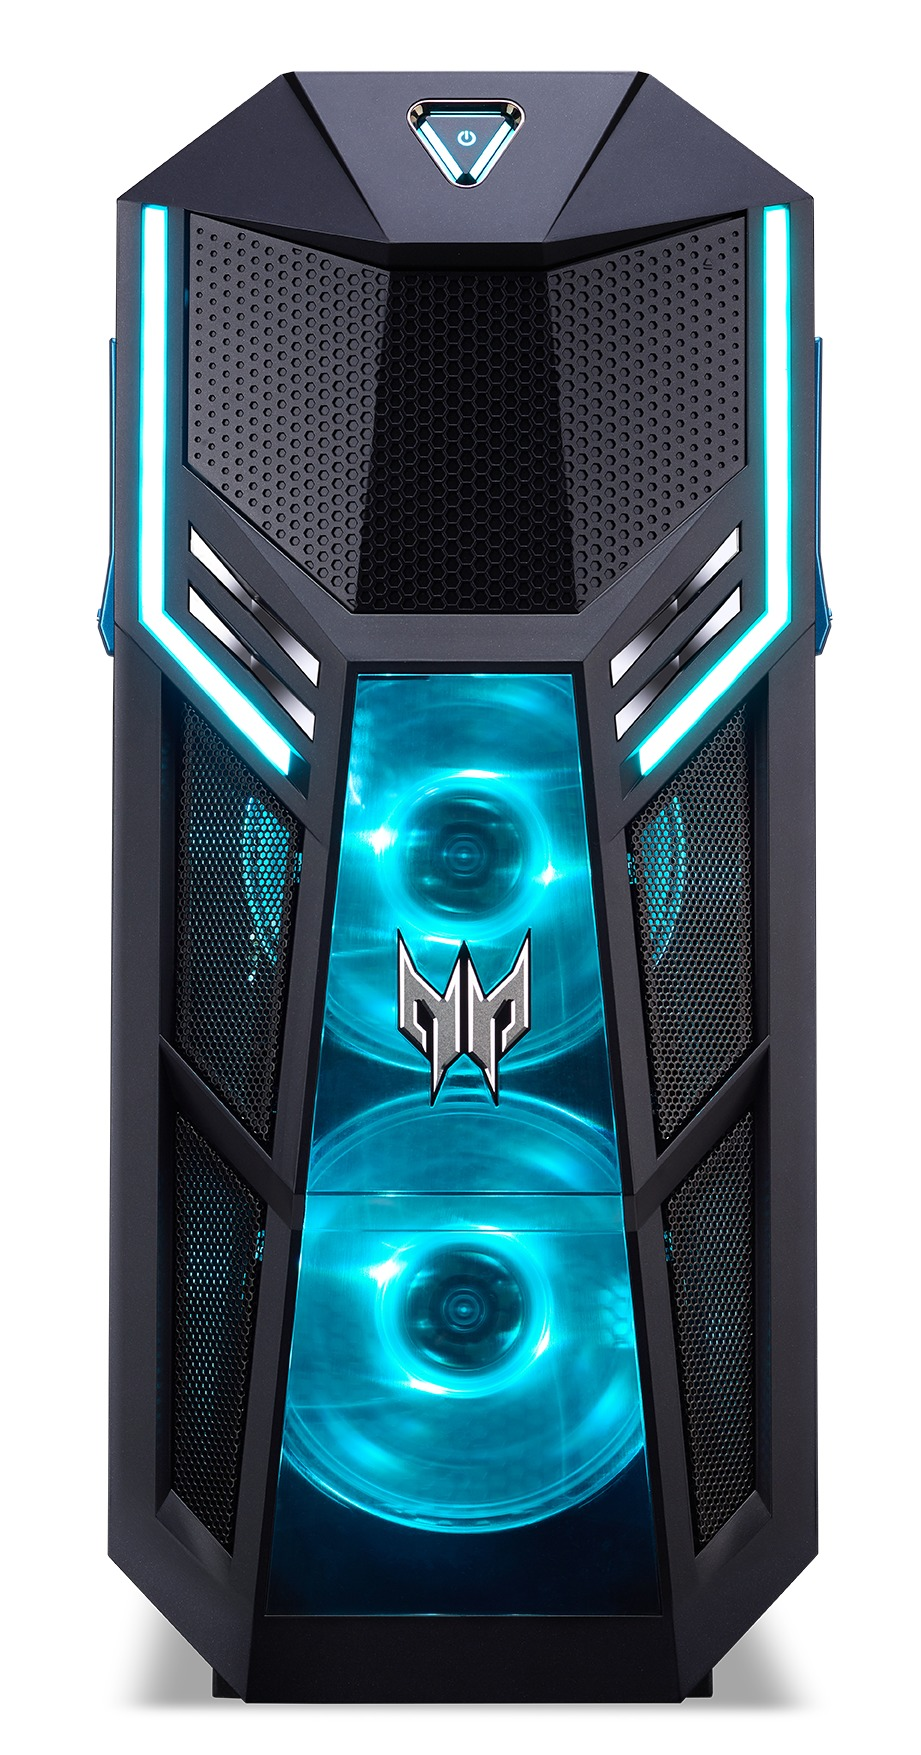 Korting Acer Predator Orion 5000 605s I9208 desktop